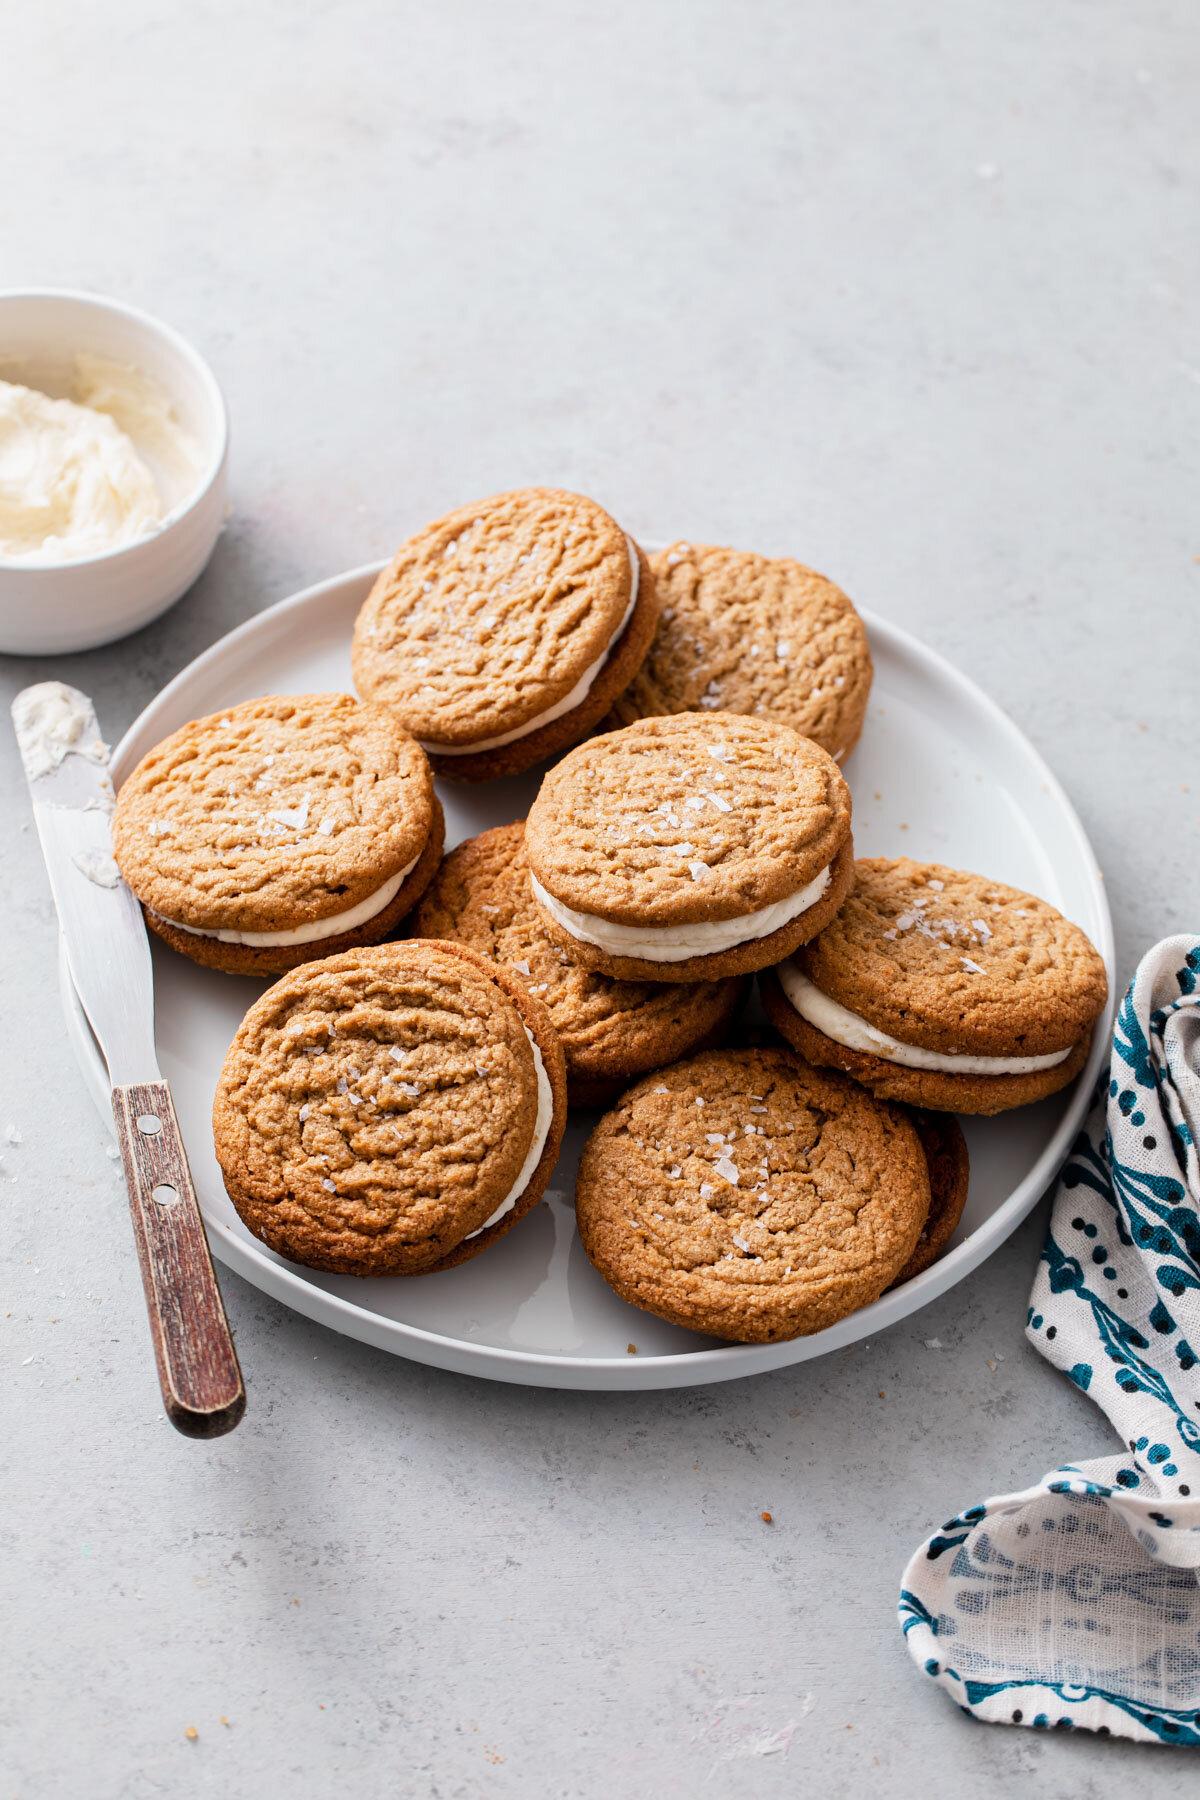 Flourless Peanut Butter Cookies with vanilla buttercream filling